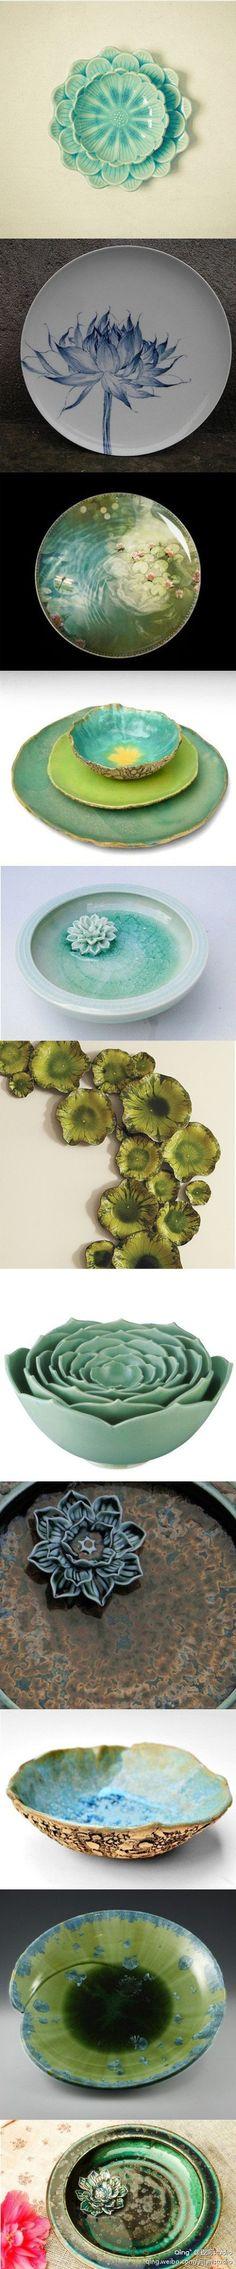 Chinese pottery #china 【醉美中国——莲·瓷】 - 纤纤捧,冰瓷莹玉,金缕鹧鸪斑,感受中华文化精髓。